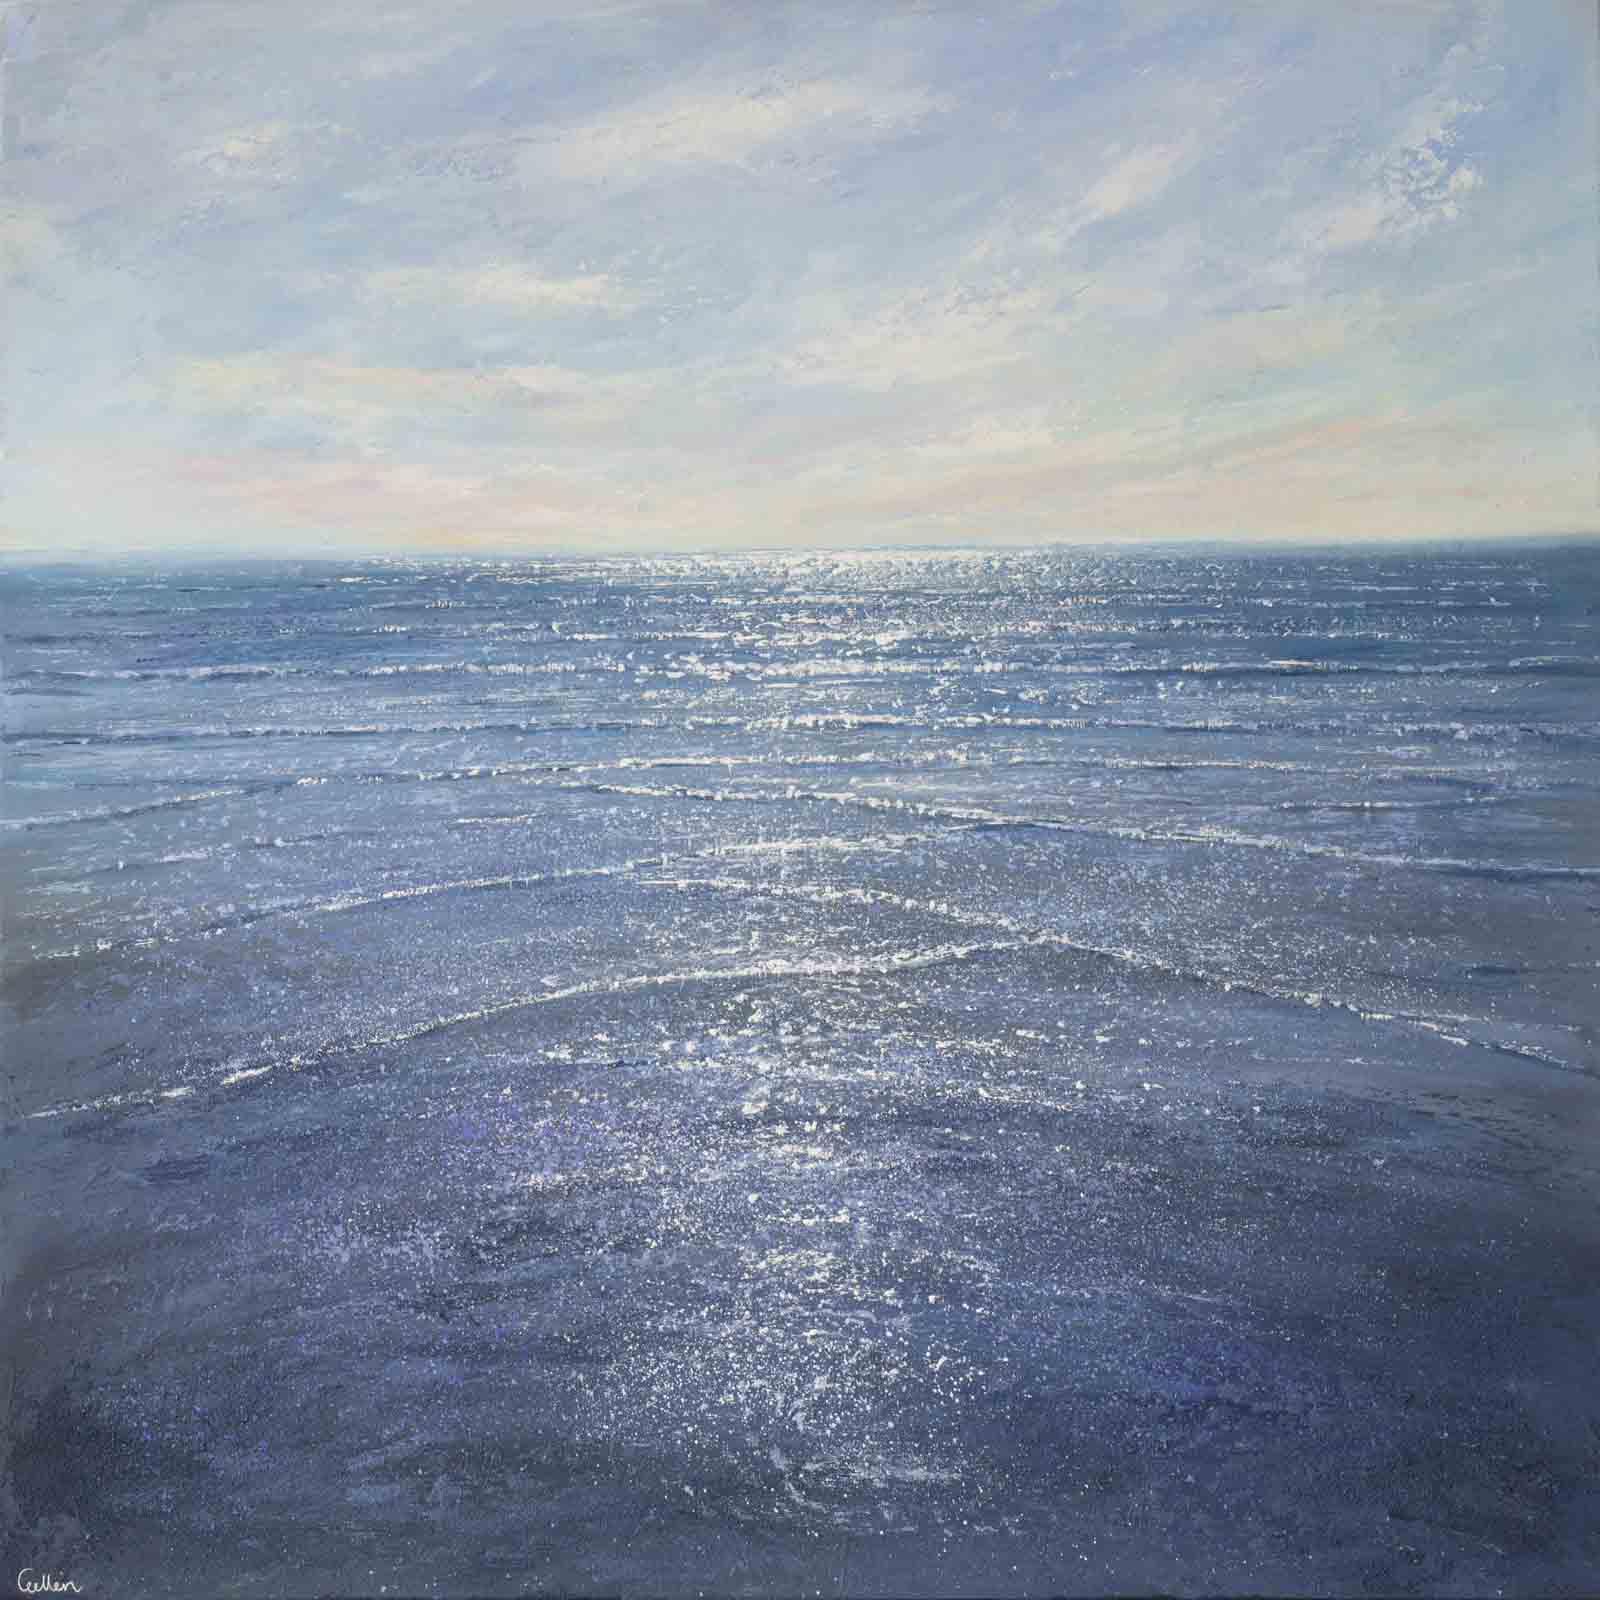 Welcoming Sea, Wittering